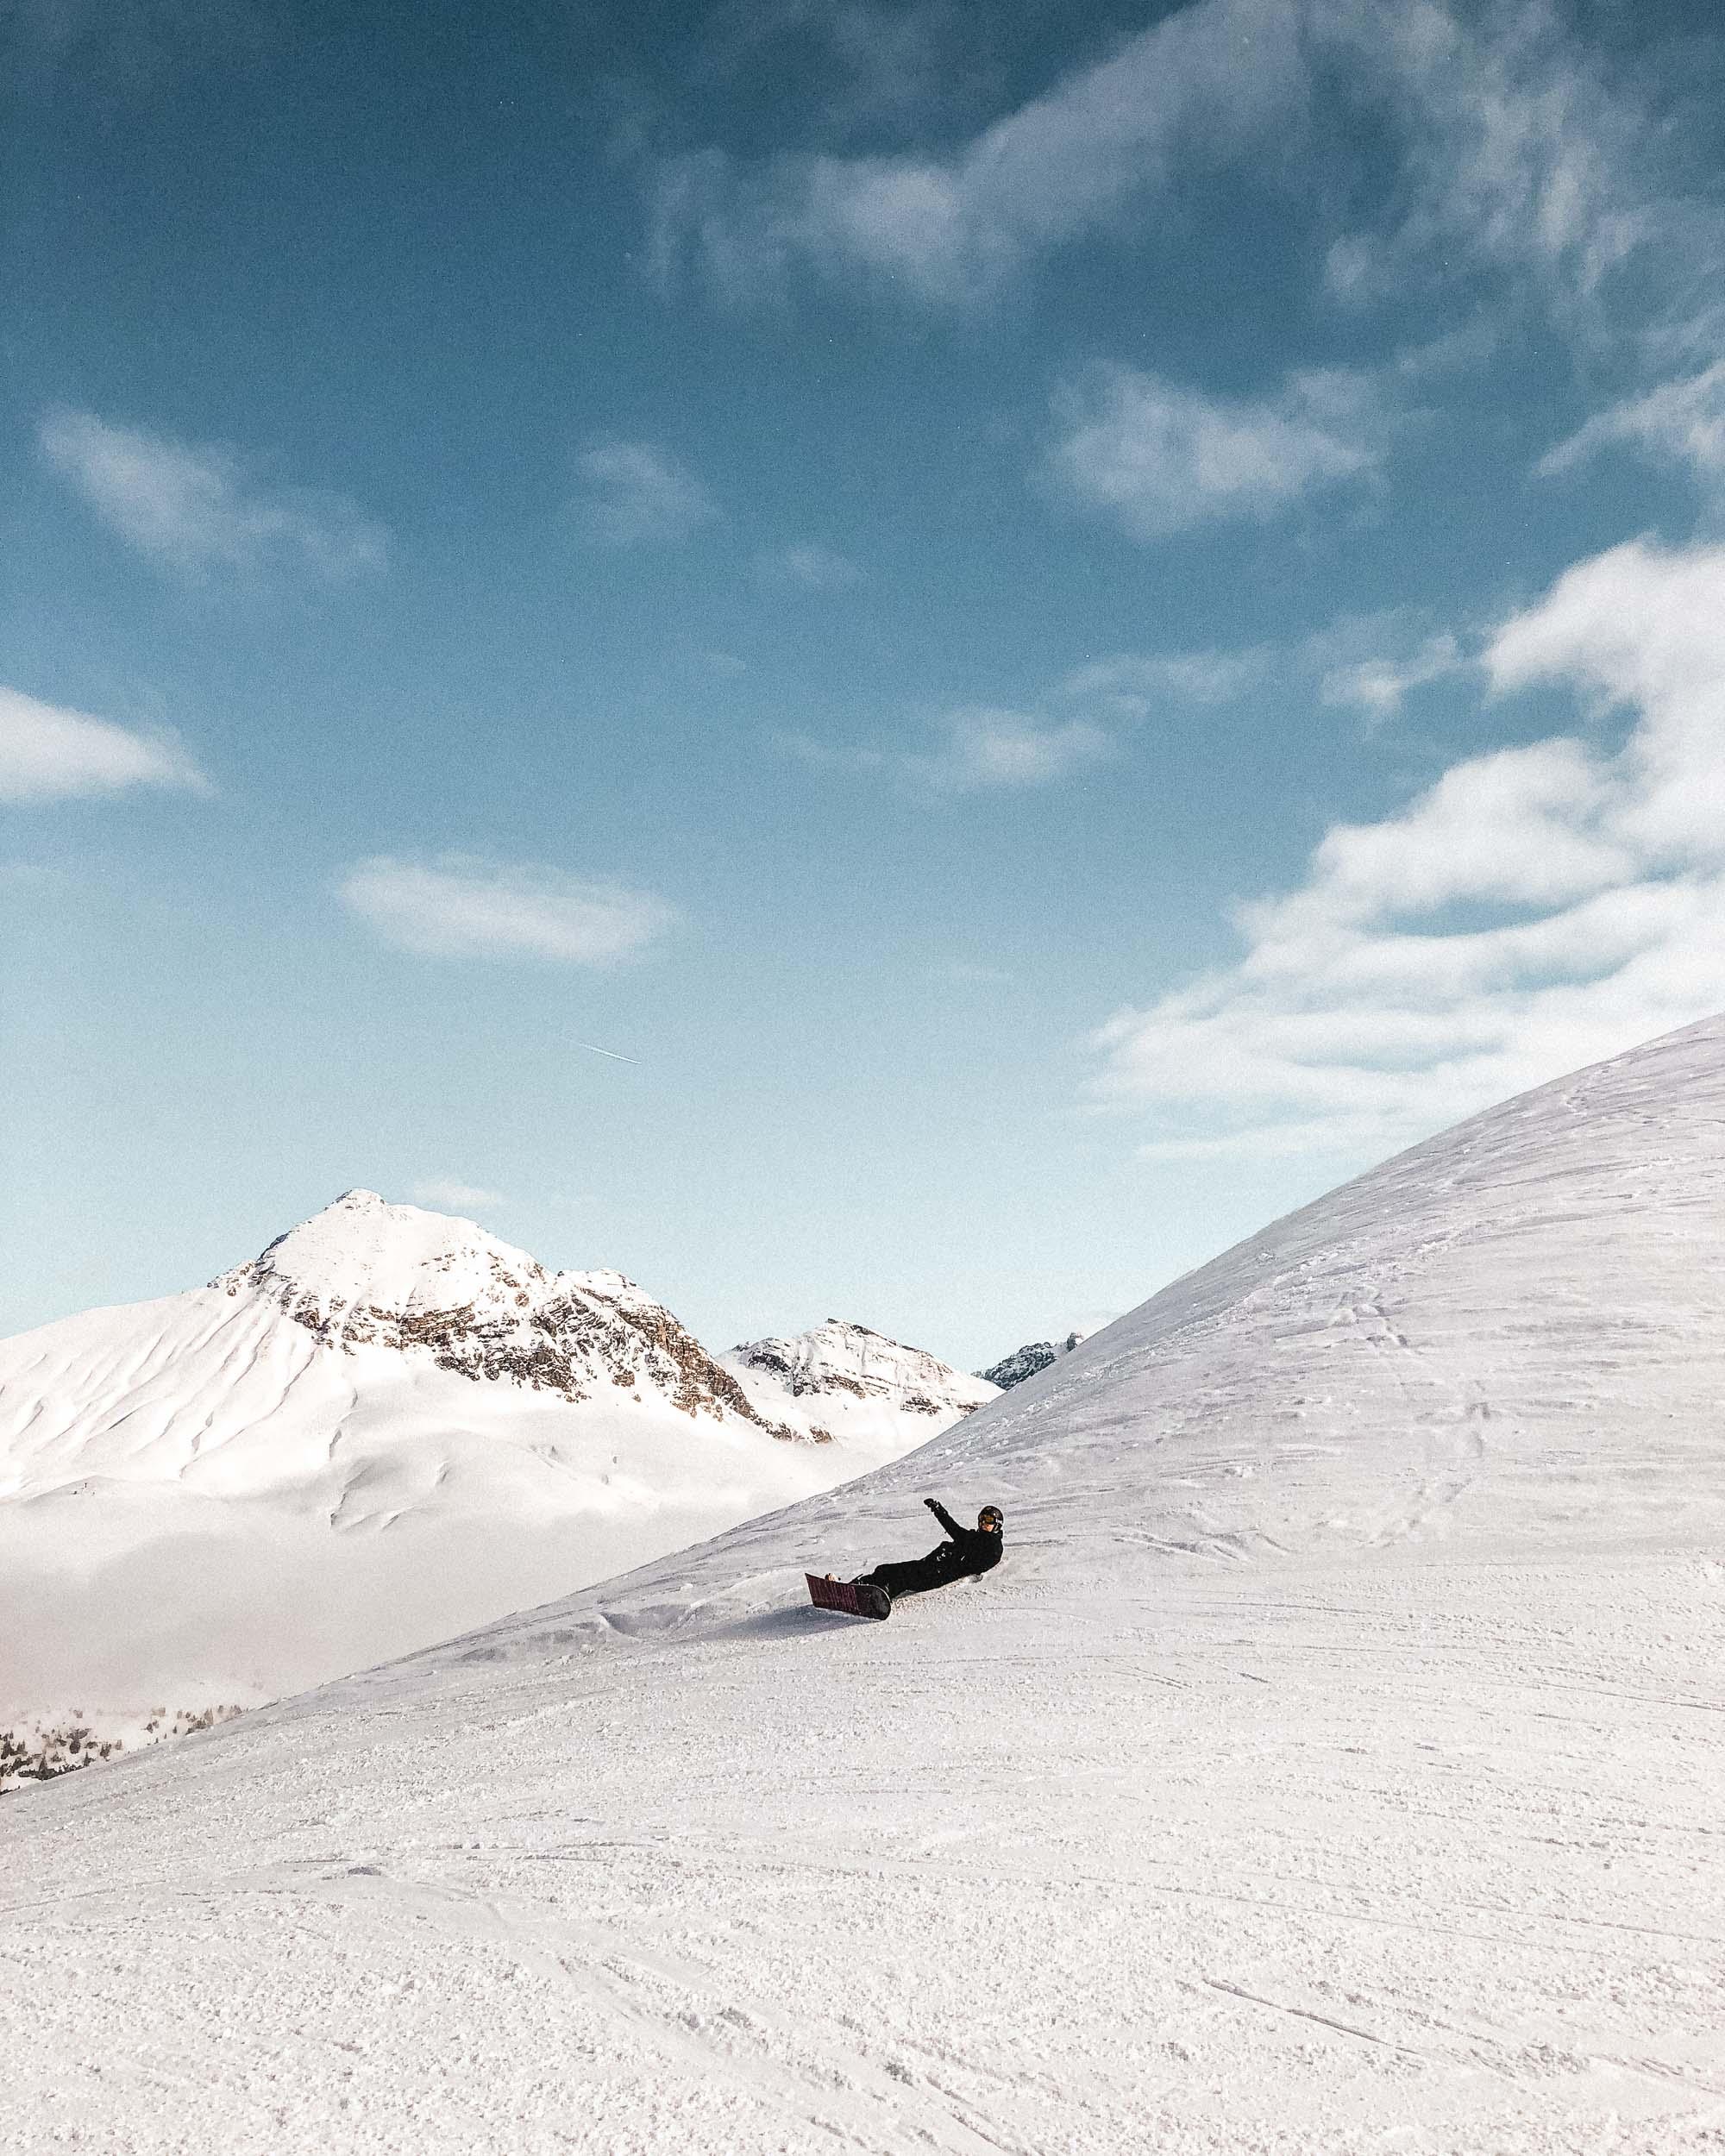 Snowboarding in Lech Austria in Europe